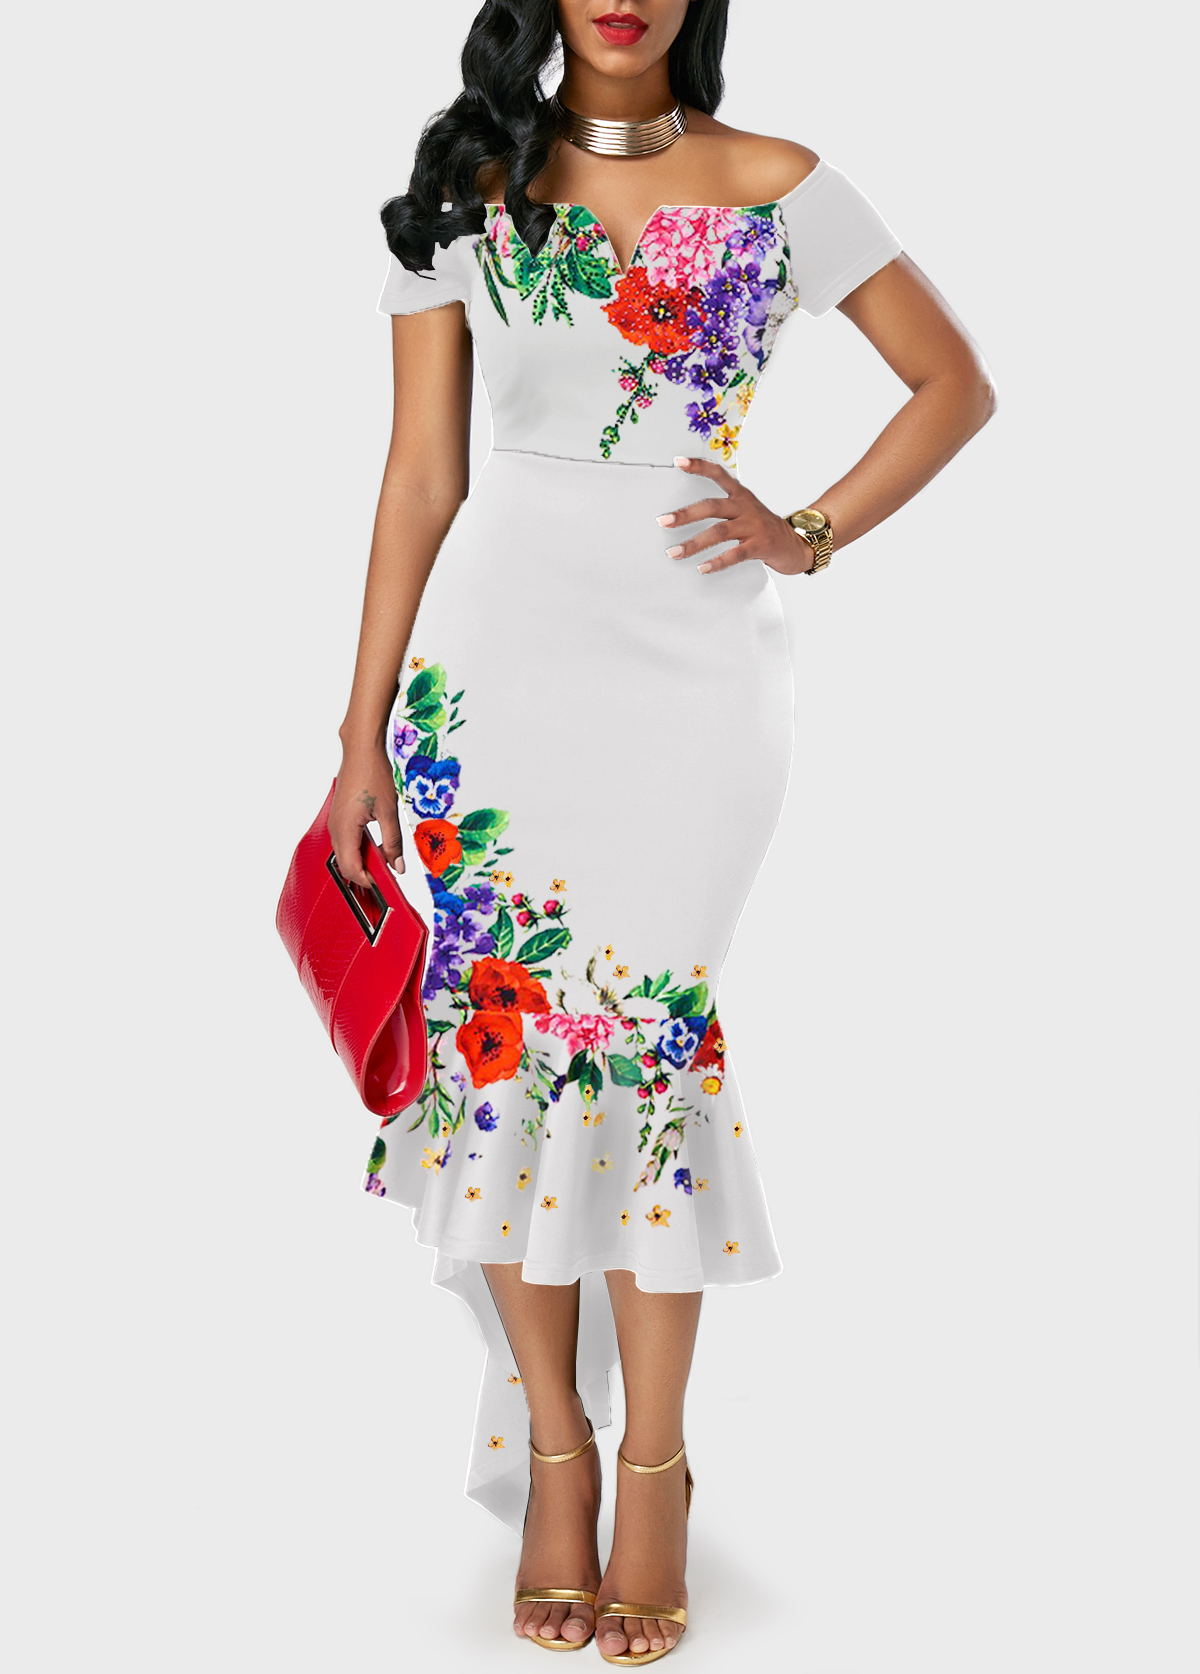 Off the Shoulder Flower Print Ruffle Hem White Dress